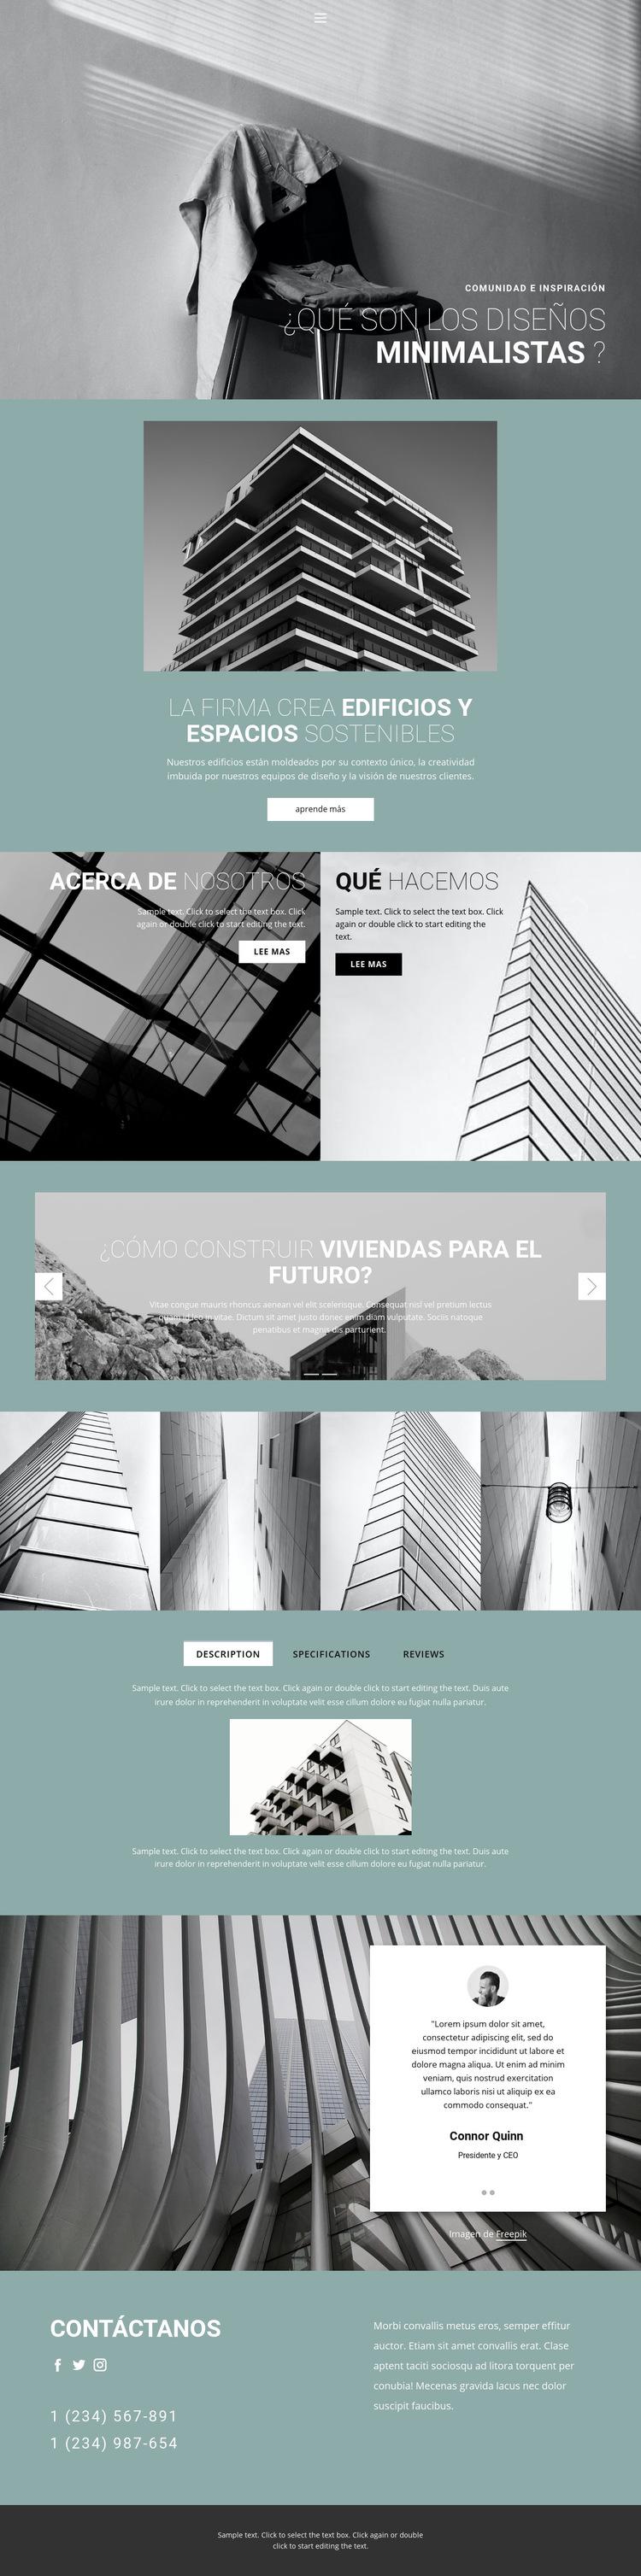 Ideas perfectas de arquitectura Plantilla de sitio web